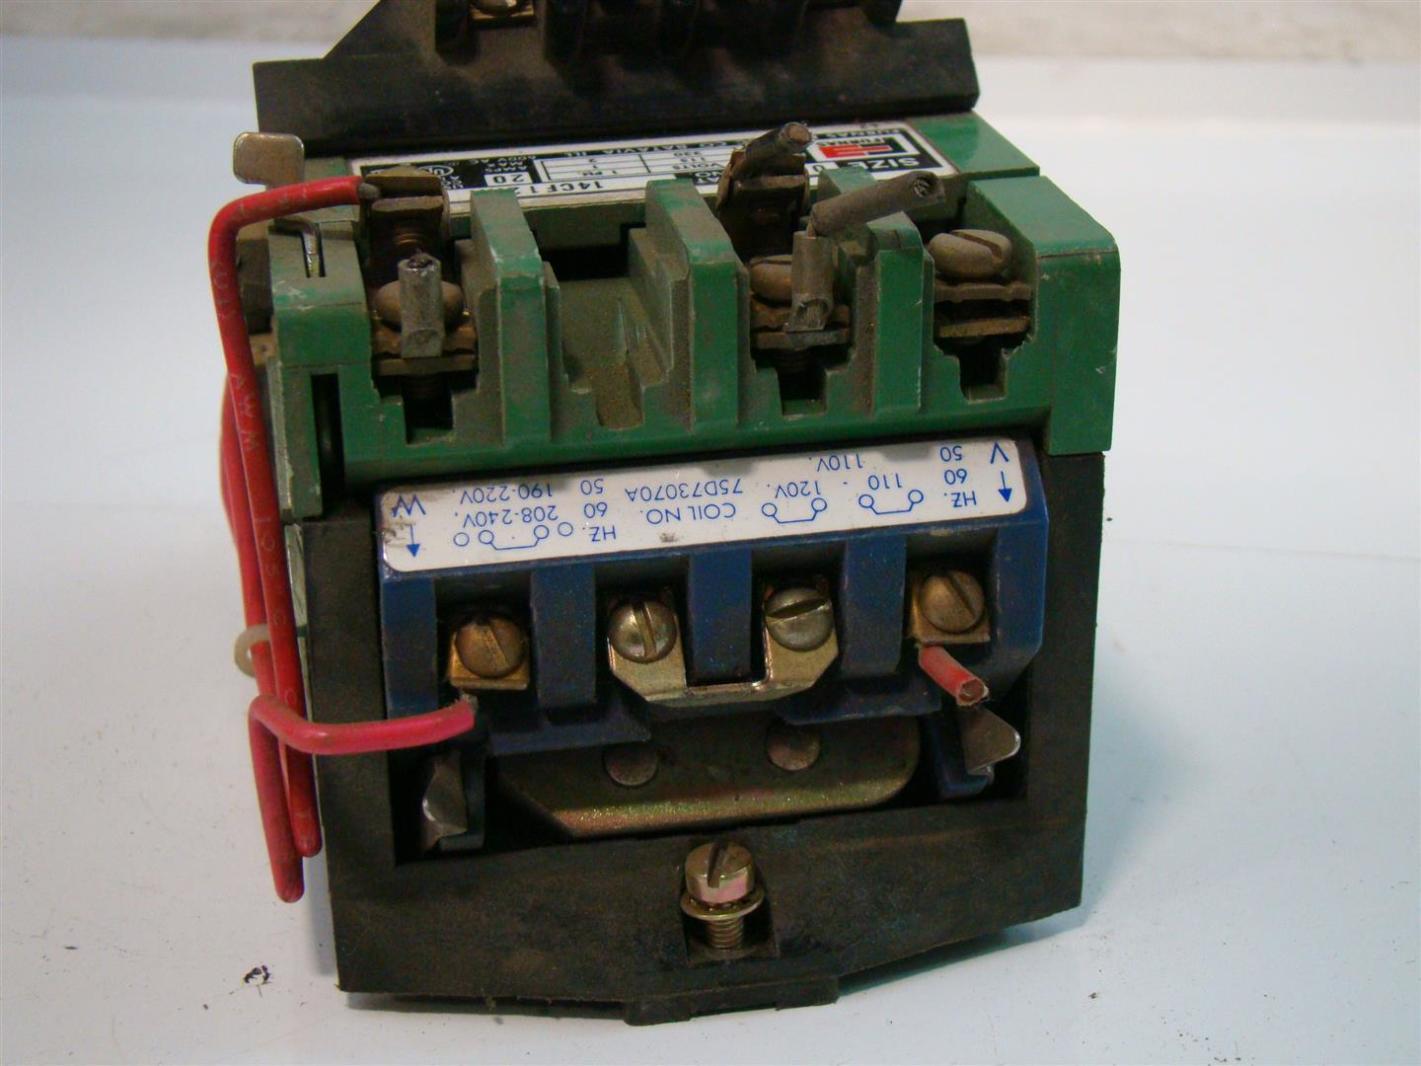 Furnas Electric Size 0 Motor Starter 115 230v 1ph 20amps